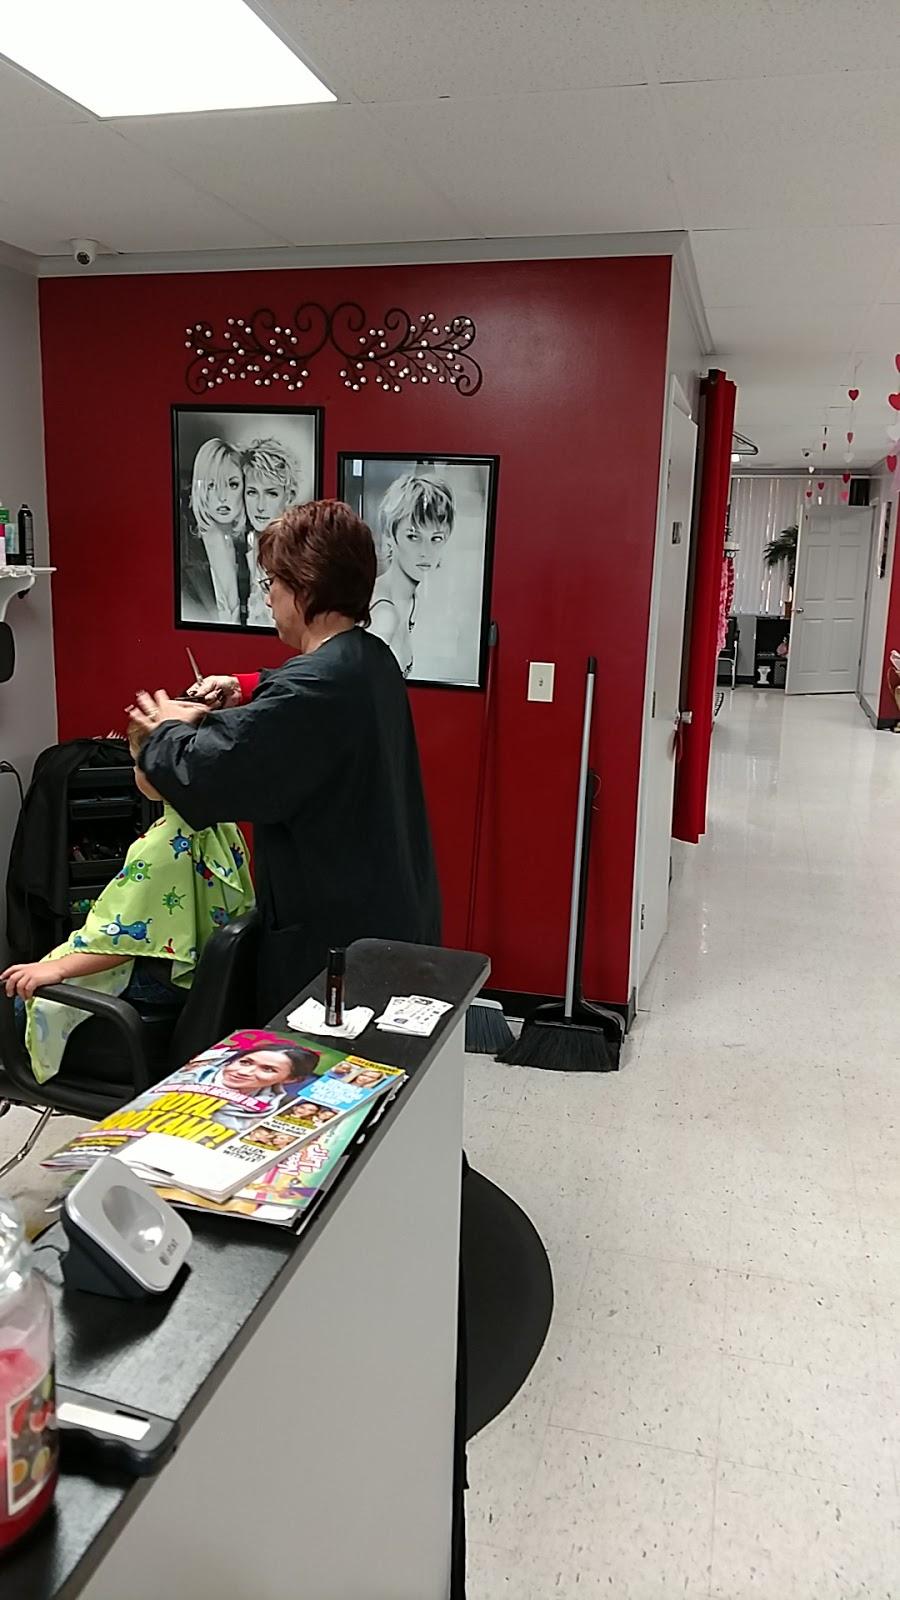 Cutz n Clips 2 - hair care  | Photo 9 of 10 | Address: 35360 FL-54, Zephyrhills, FL 33541, USA | Phone: (813) 782-8888